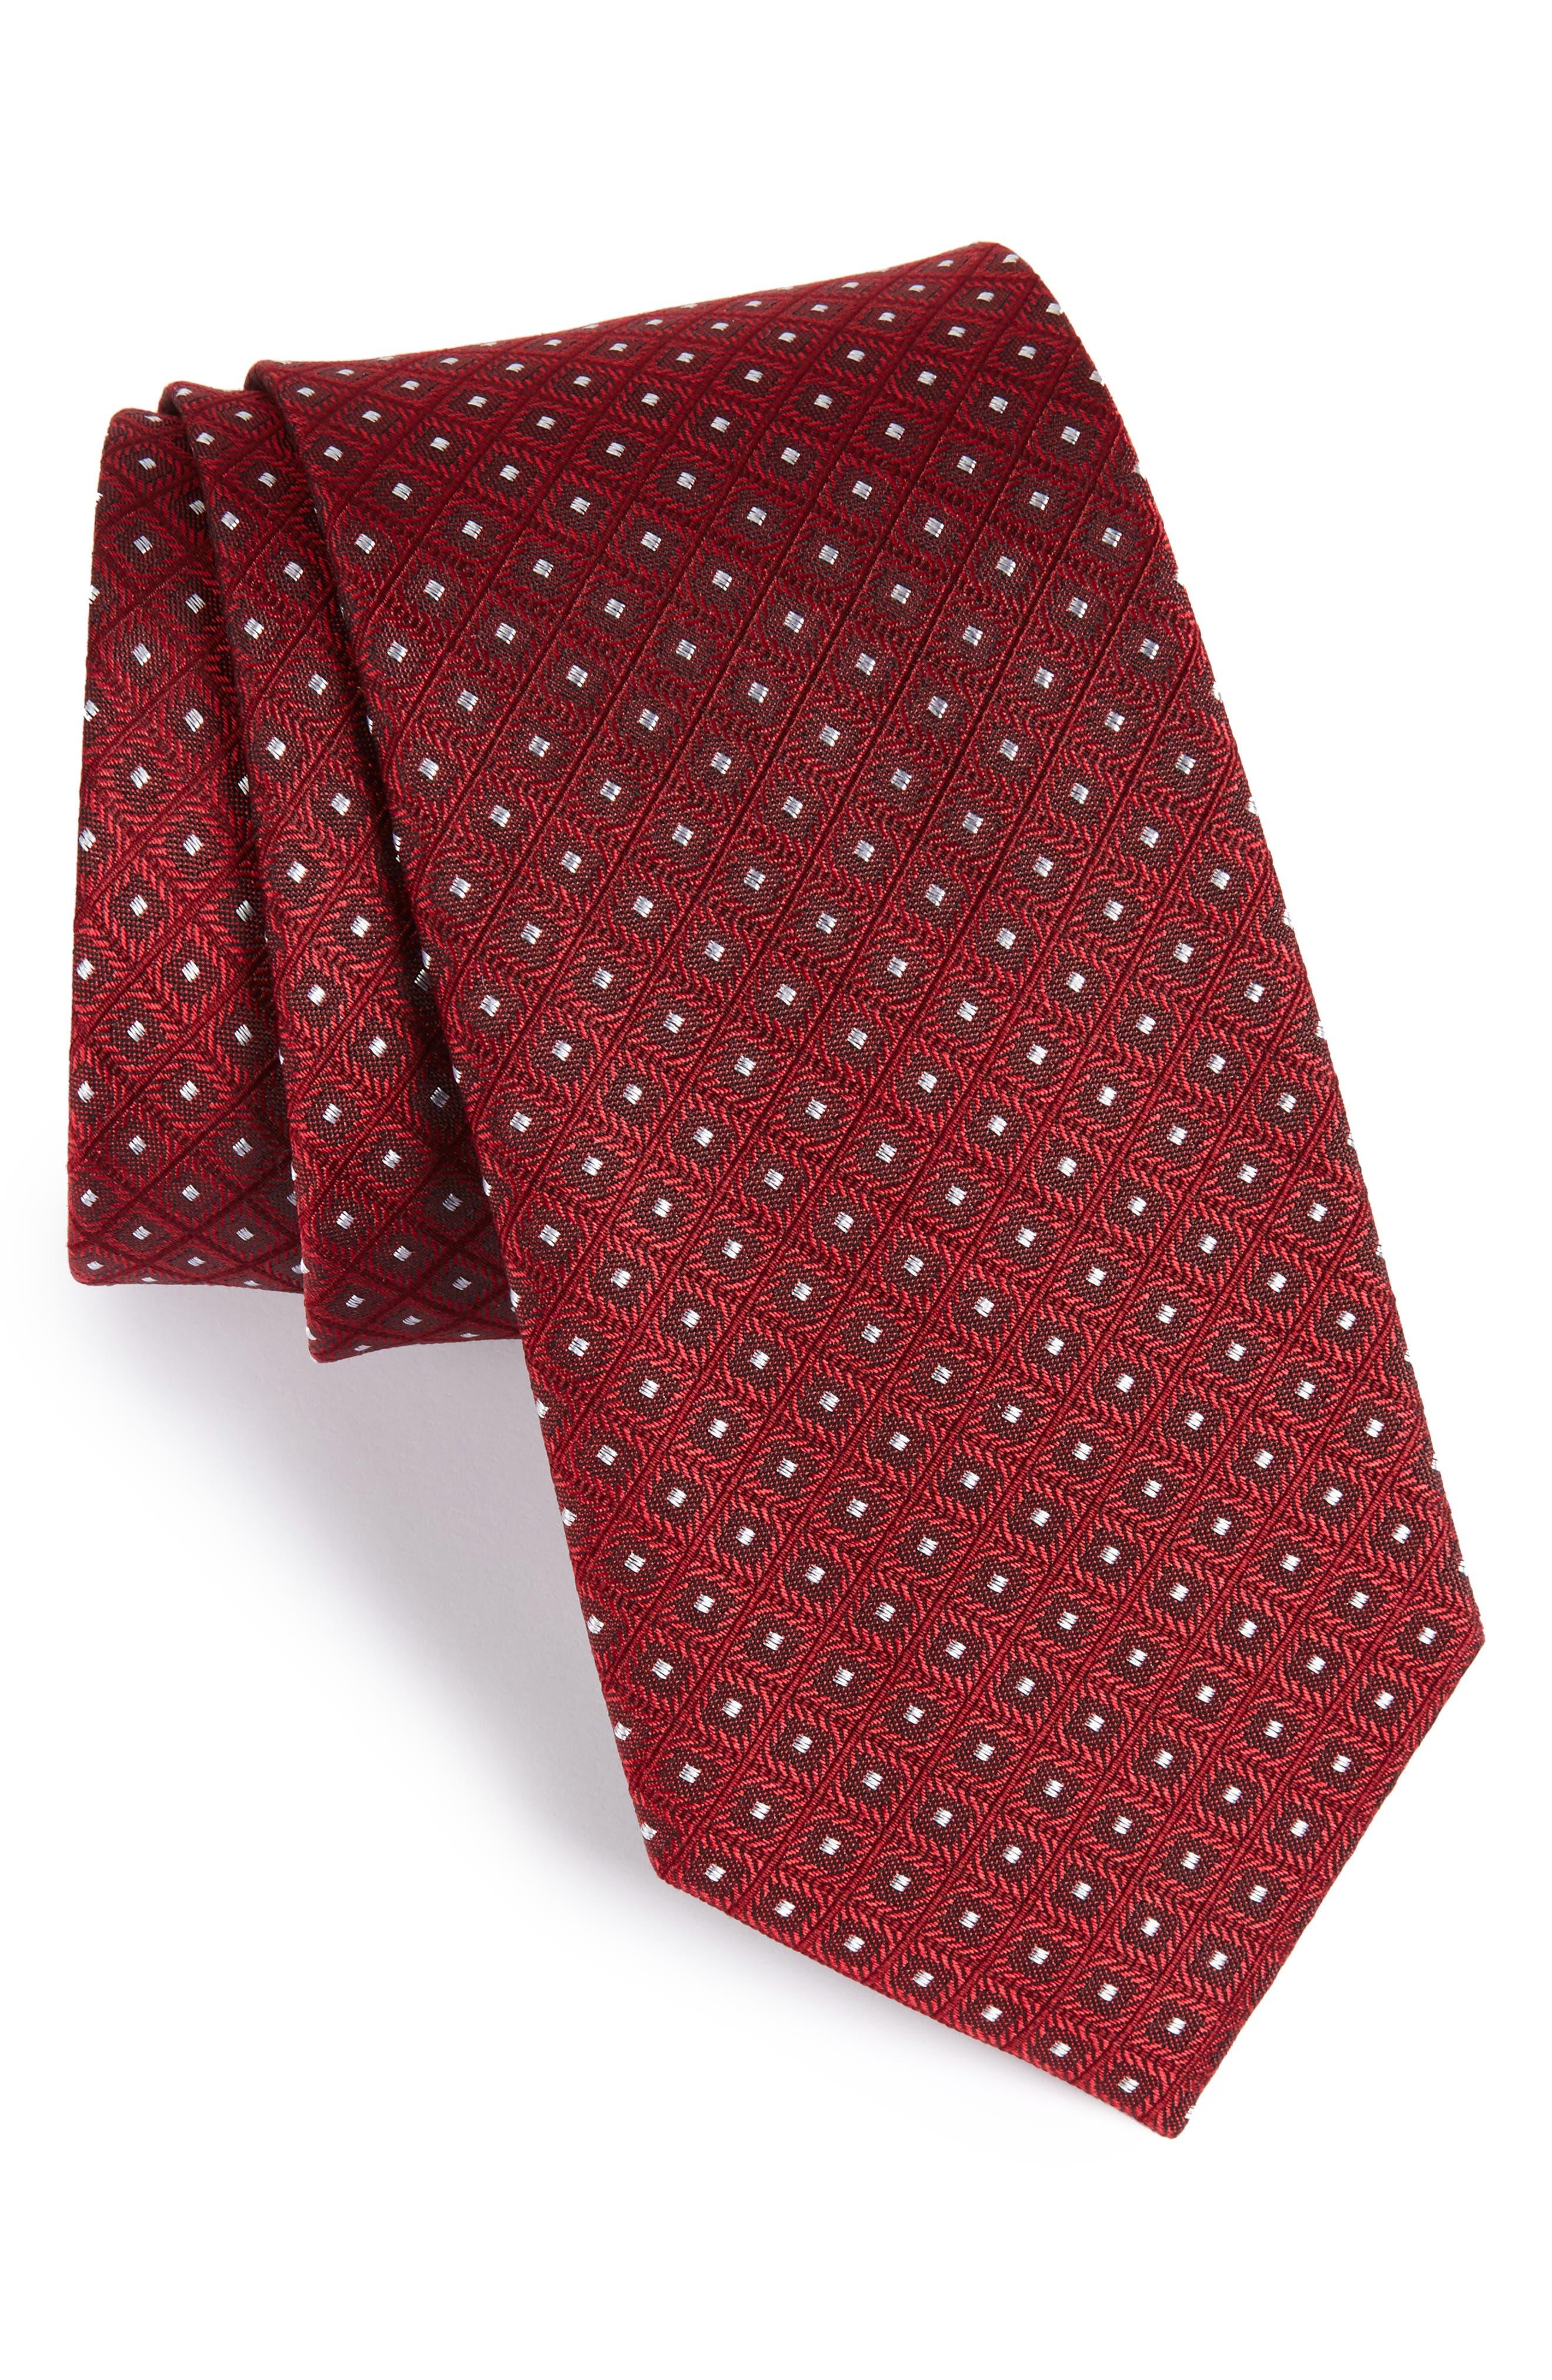 The Tie Bar Wacker Drive Silk Tie